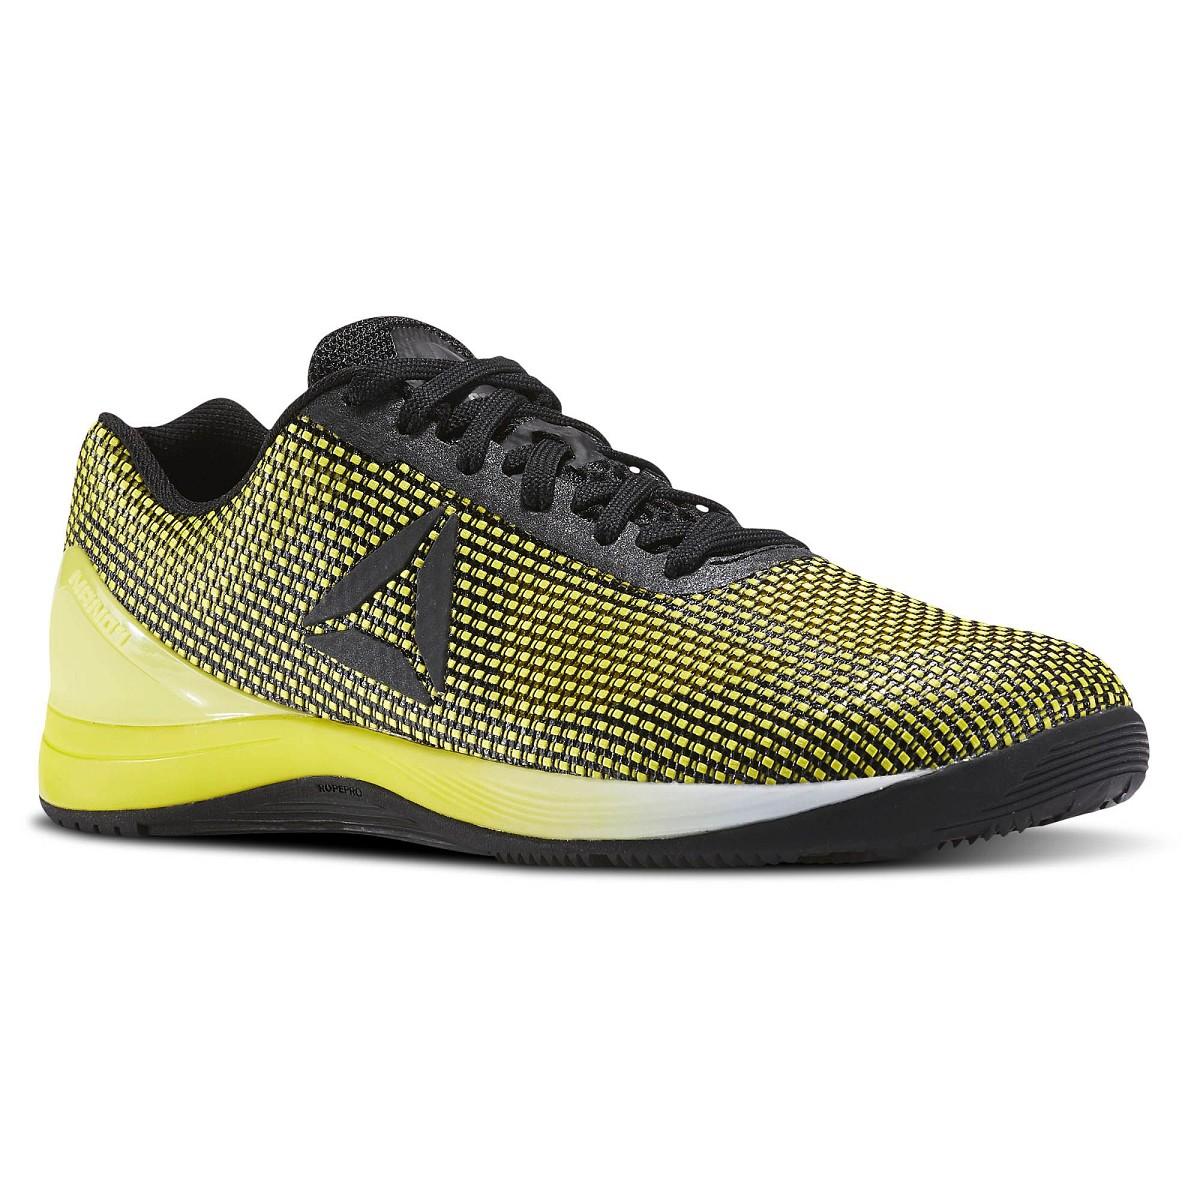 scarpa reebok crossfit nano 7 0 bd5020 giallo scarpe uomo crossfit reebok. Black Bedroom Furniture Sets. Home Design Ideas